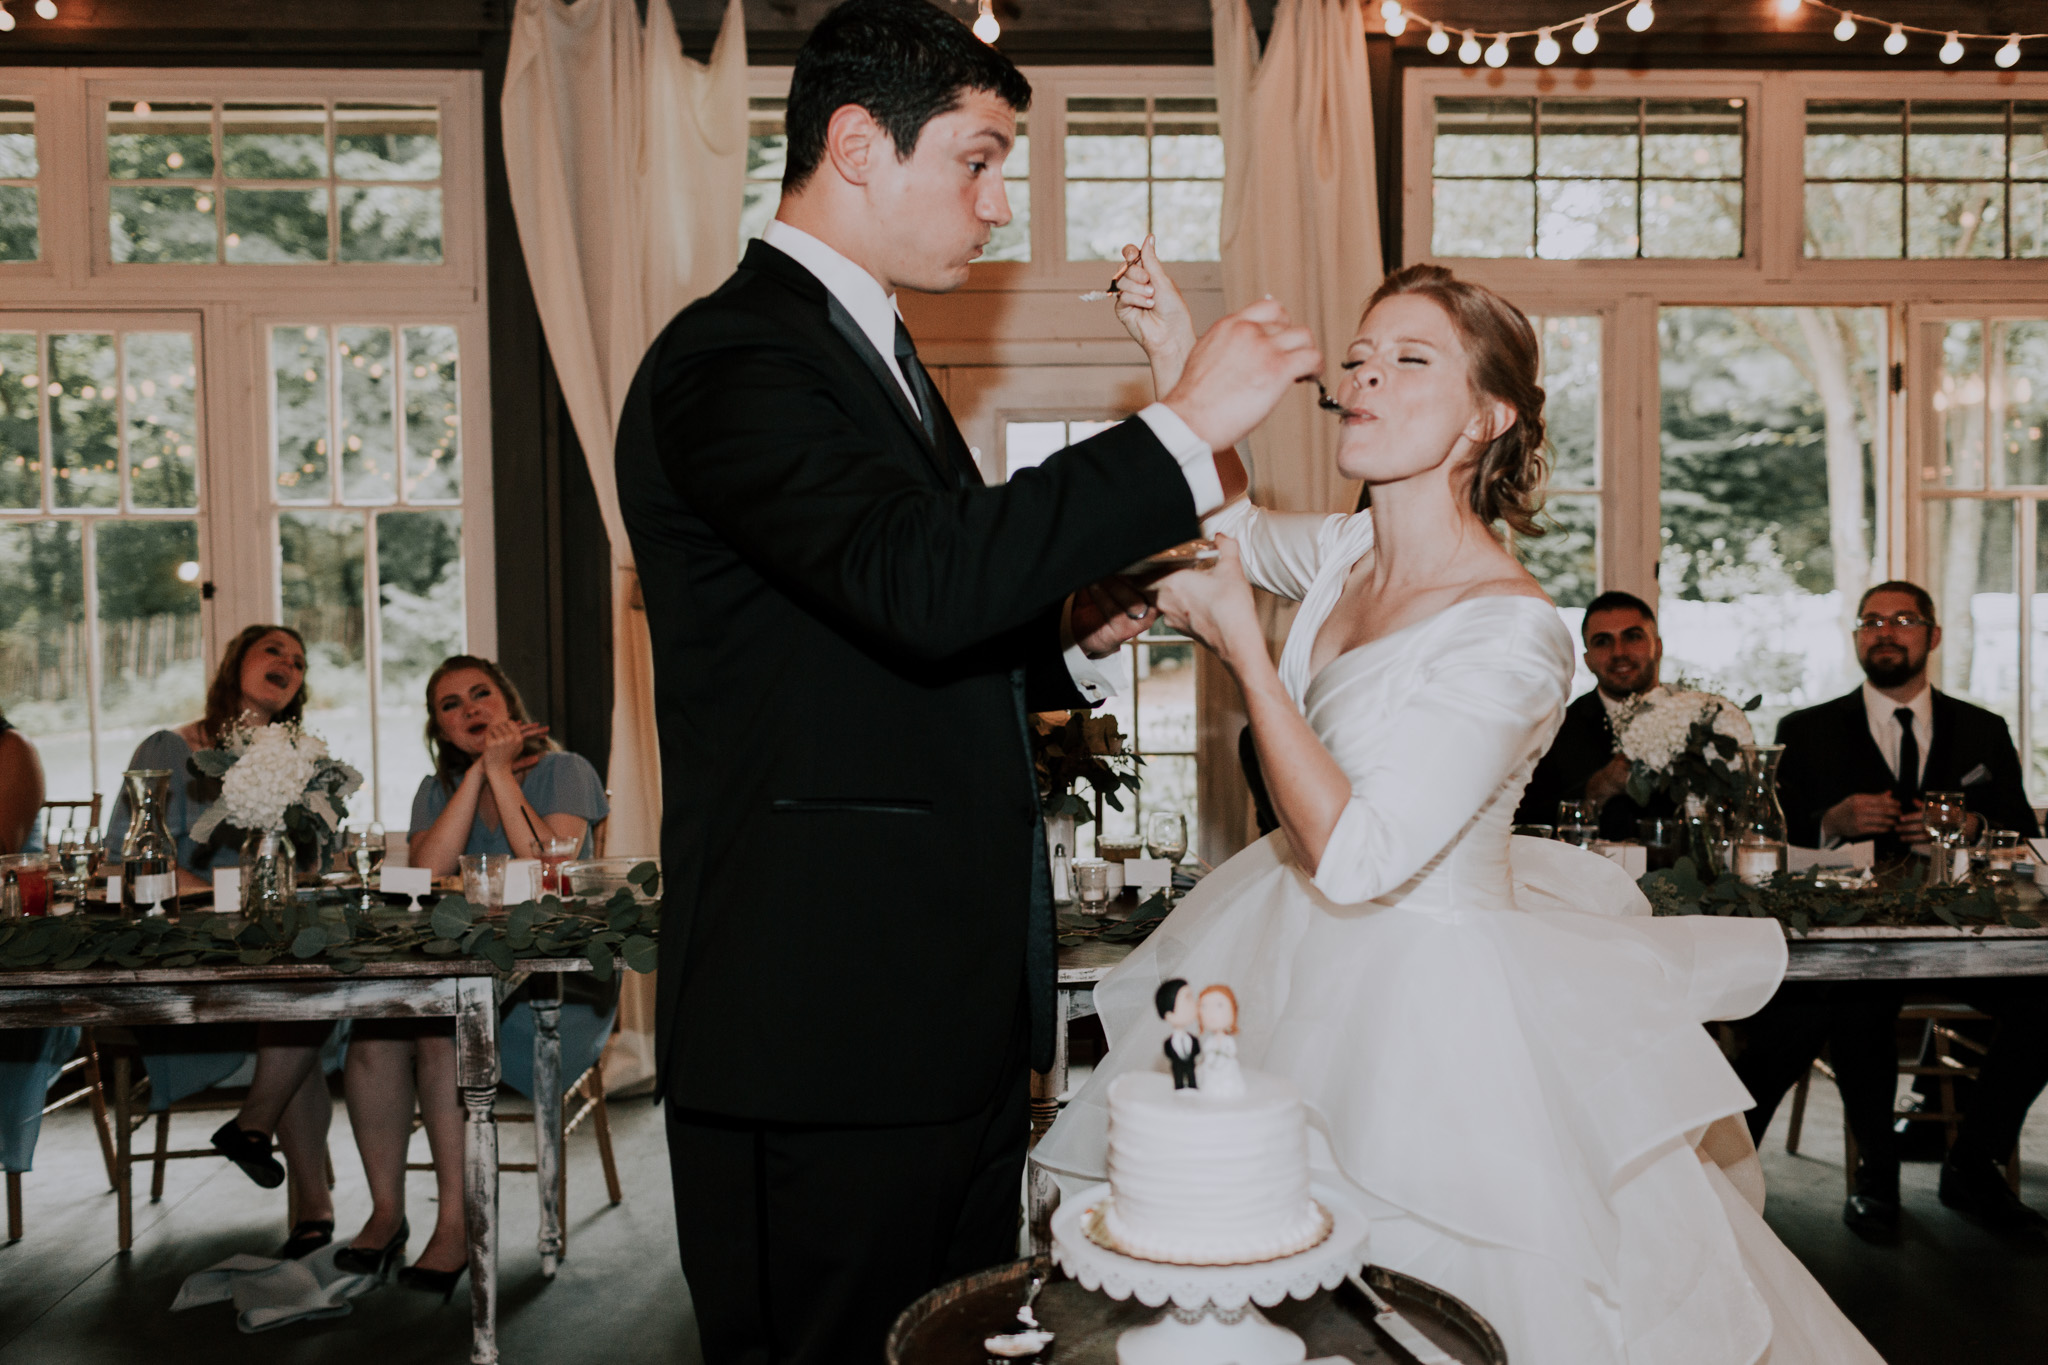 MillCreek-Wilde-Wedding-Barn-Michigan-Eliza-Eric-Vafa-Photo1057.jpg